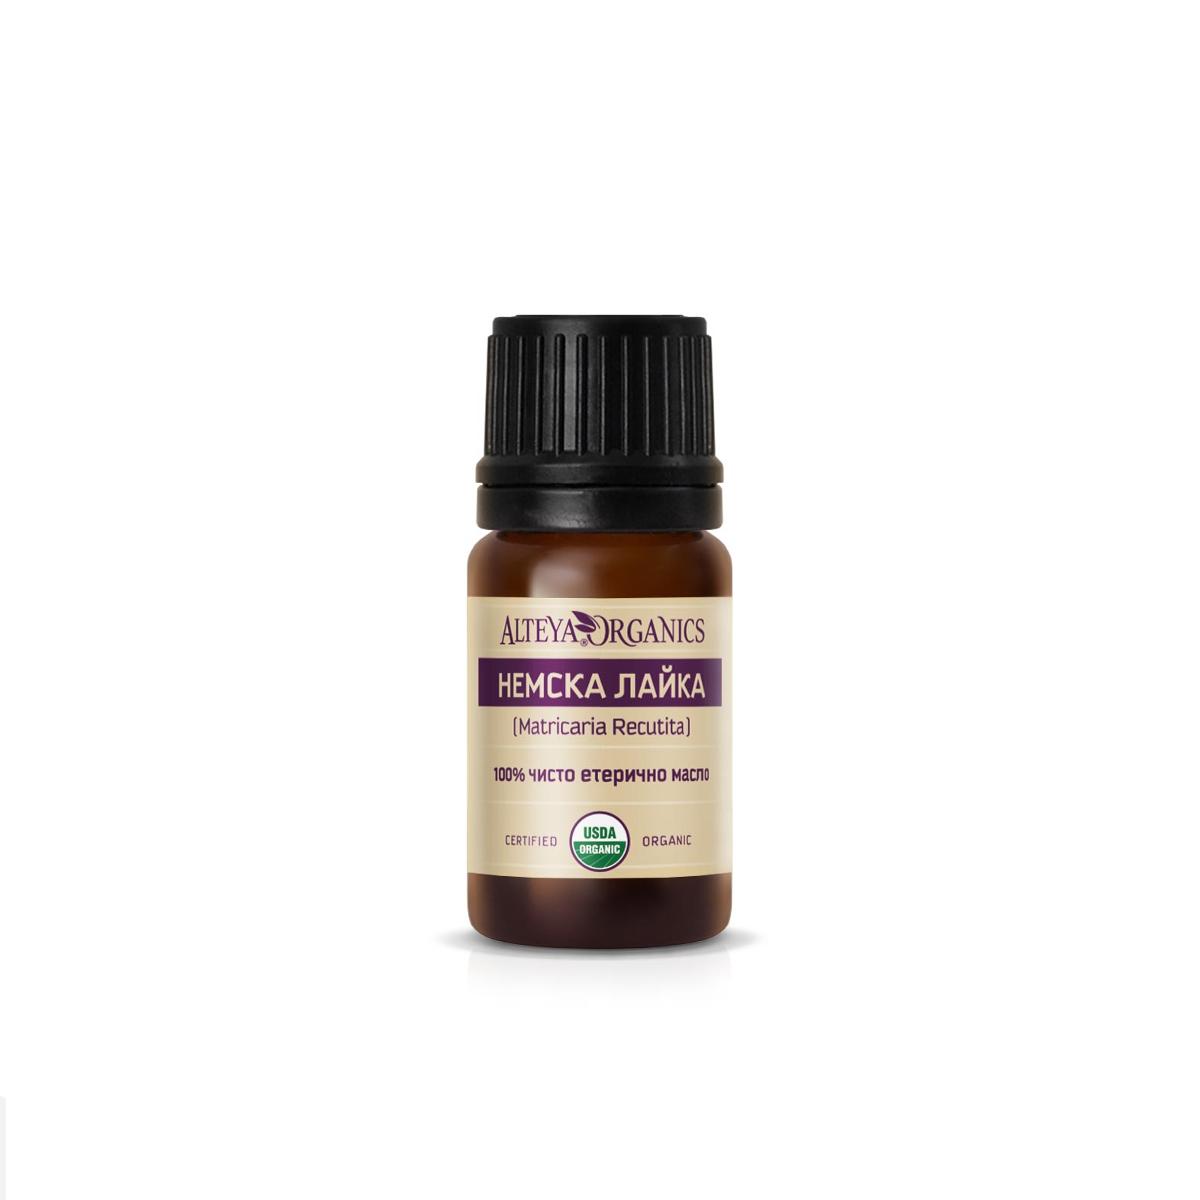 Bio organic essential German chamomile oil Alteya Organics